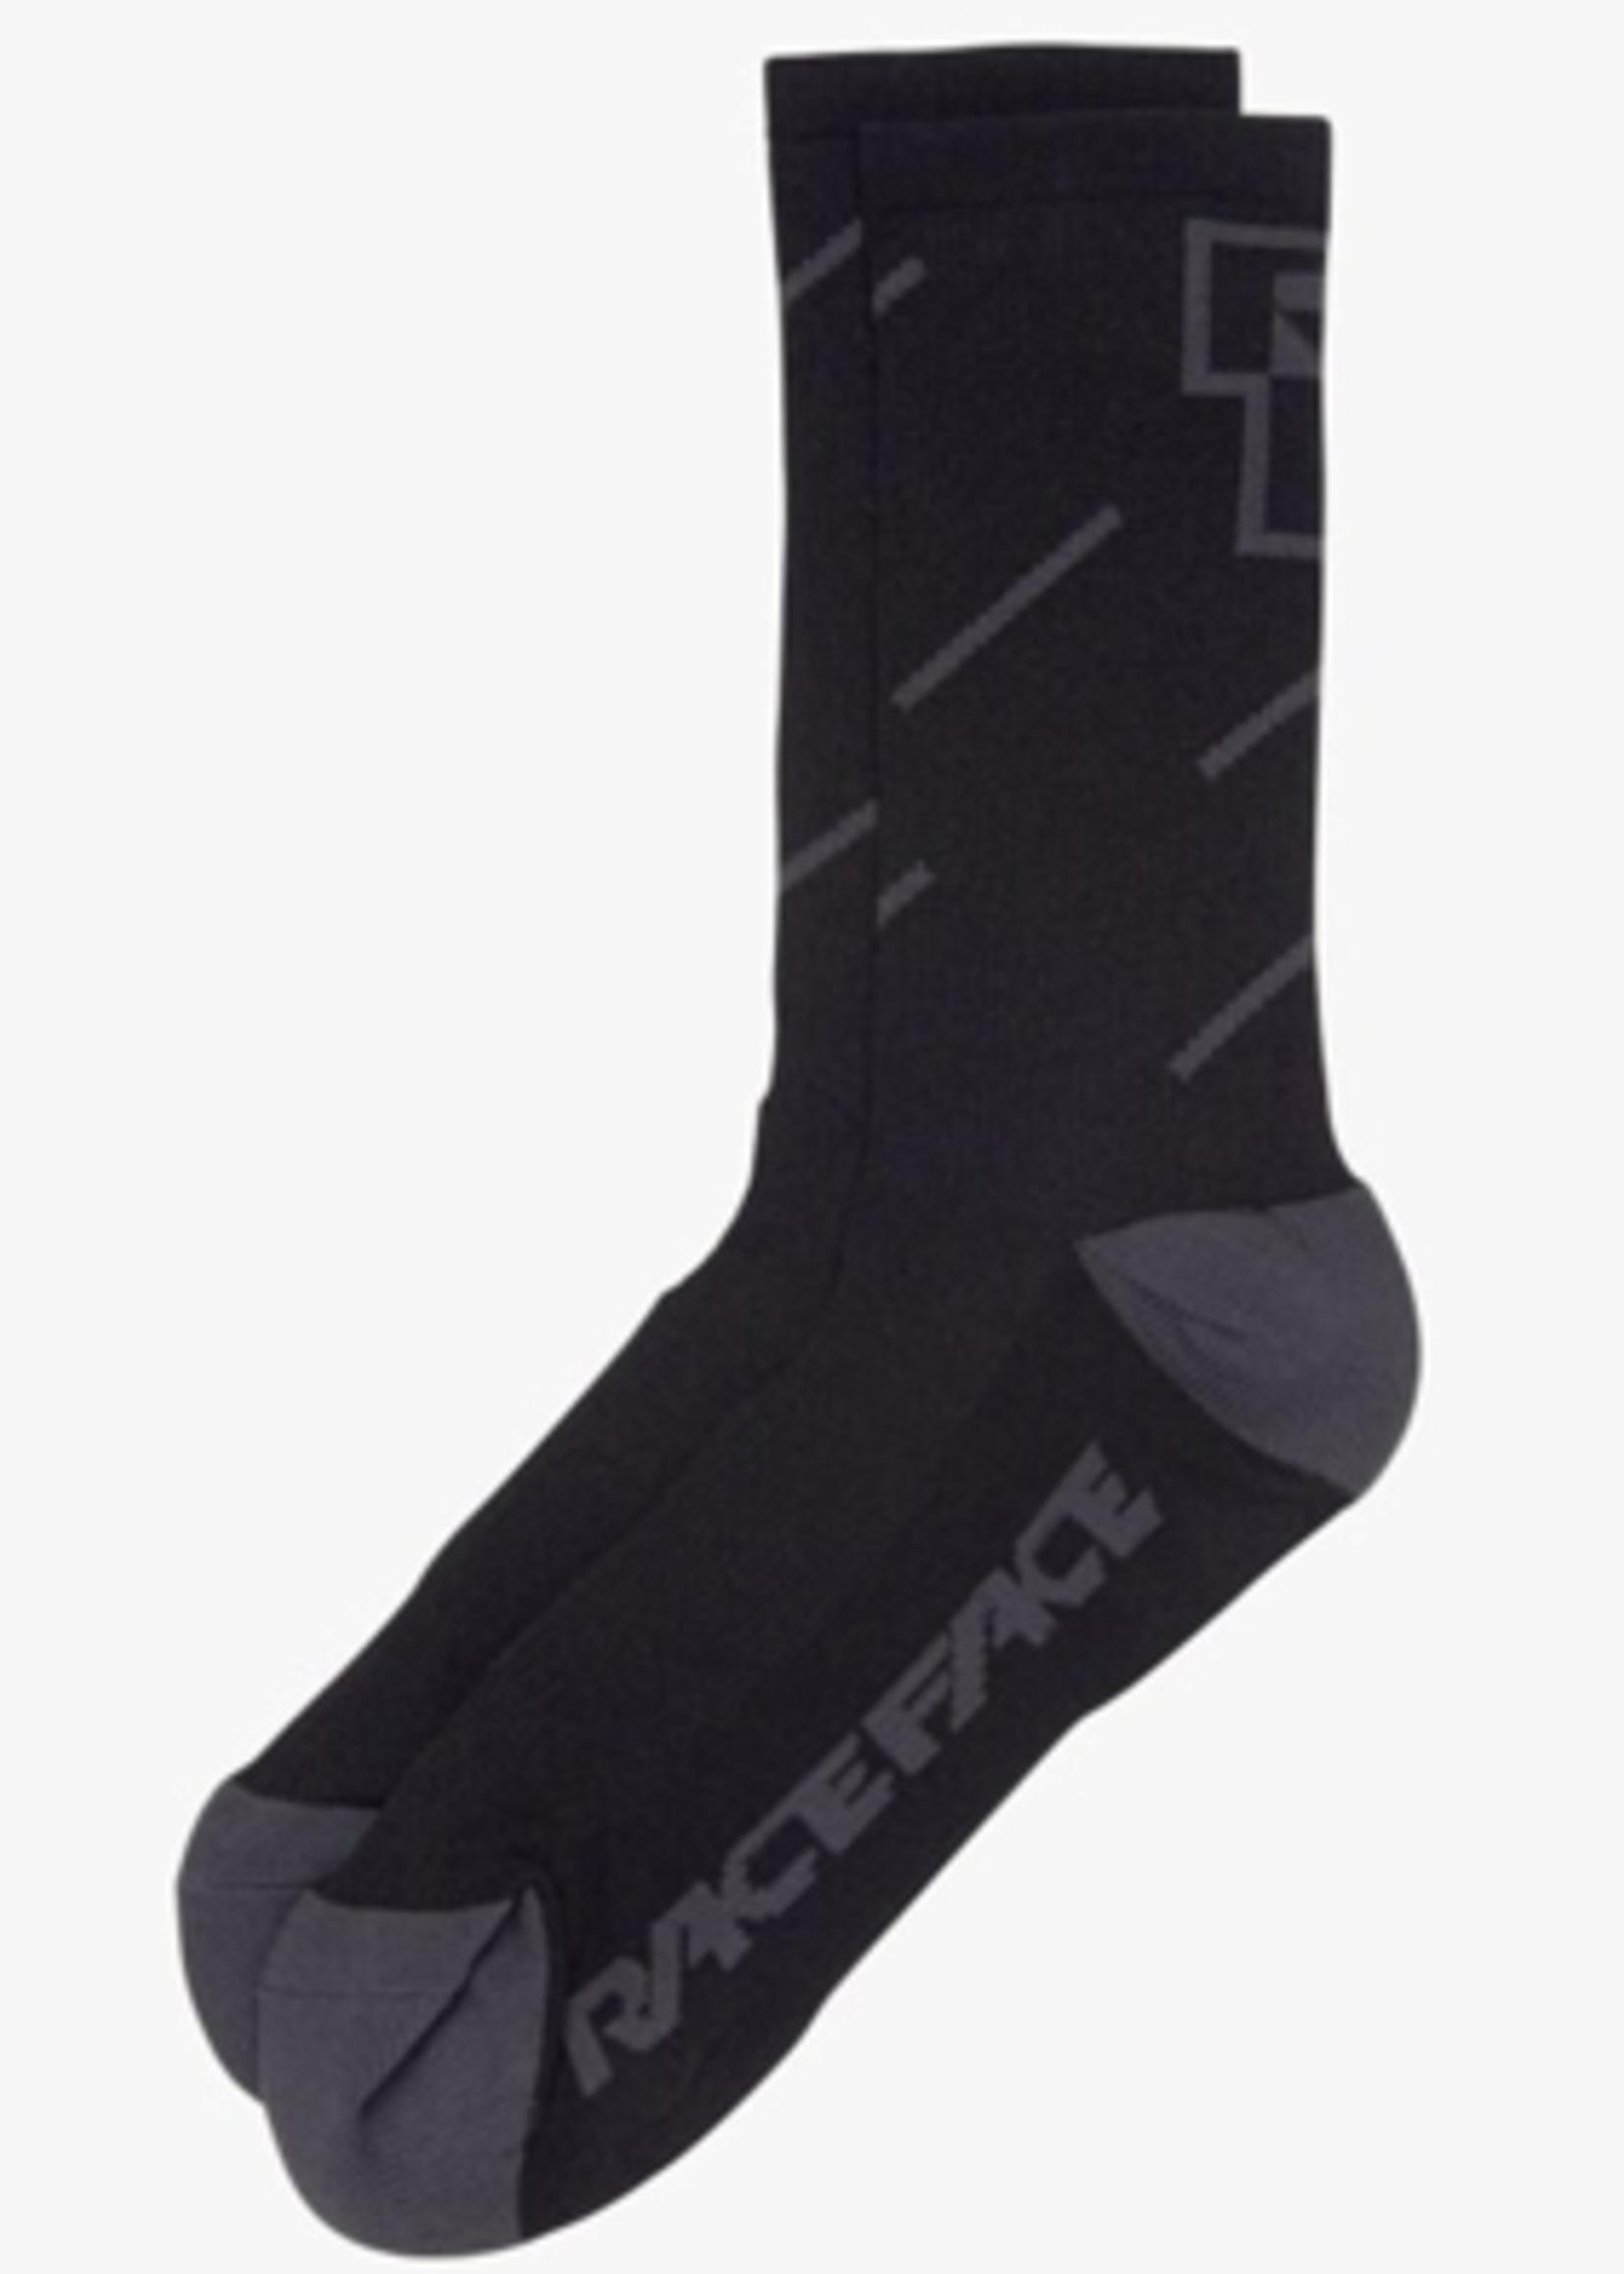 Raceface RaceFace Gear Jammer Socks